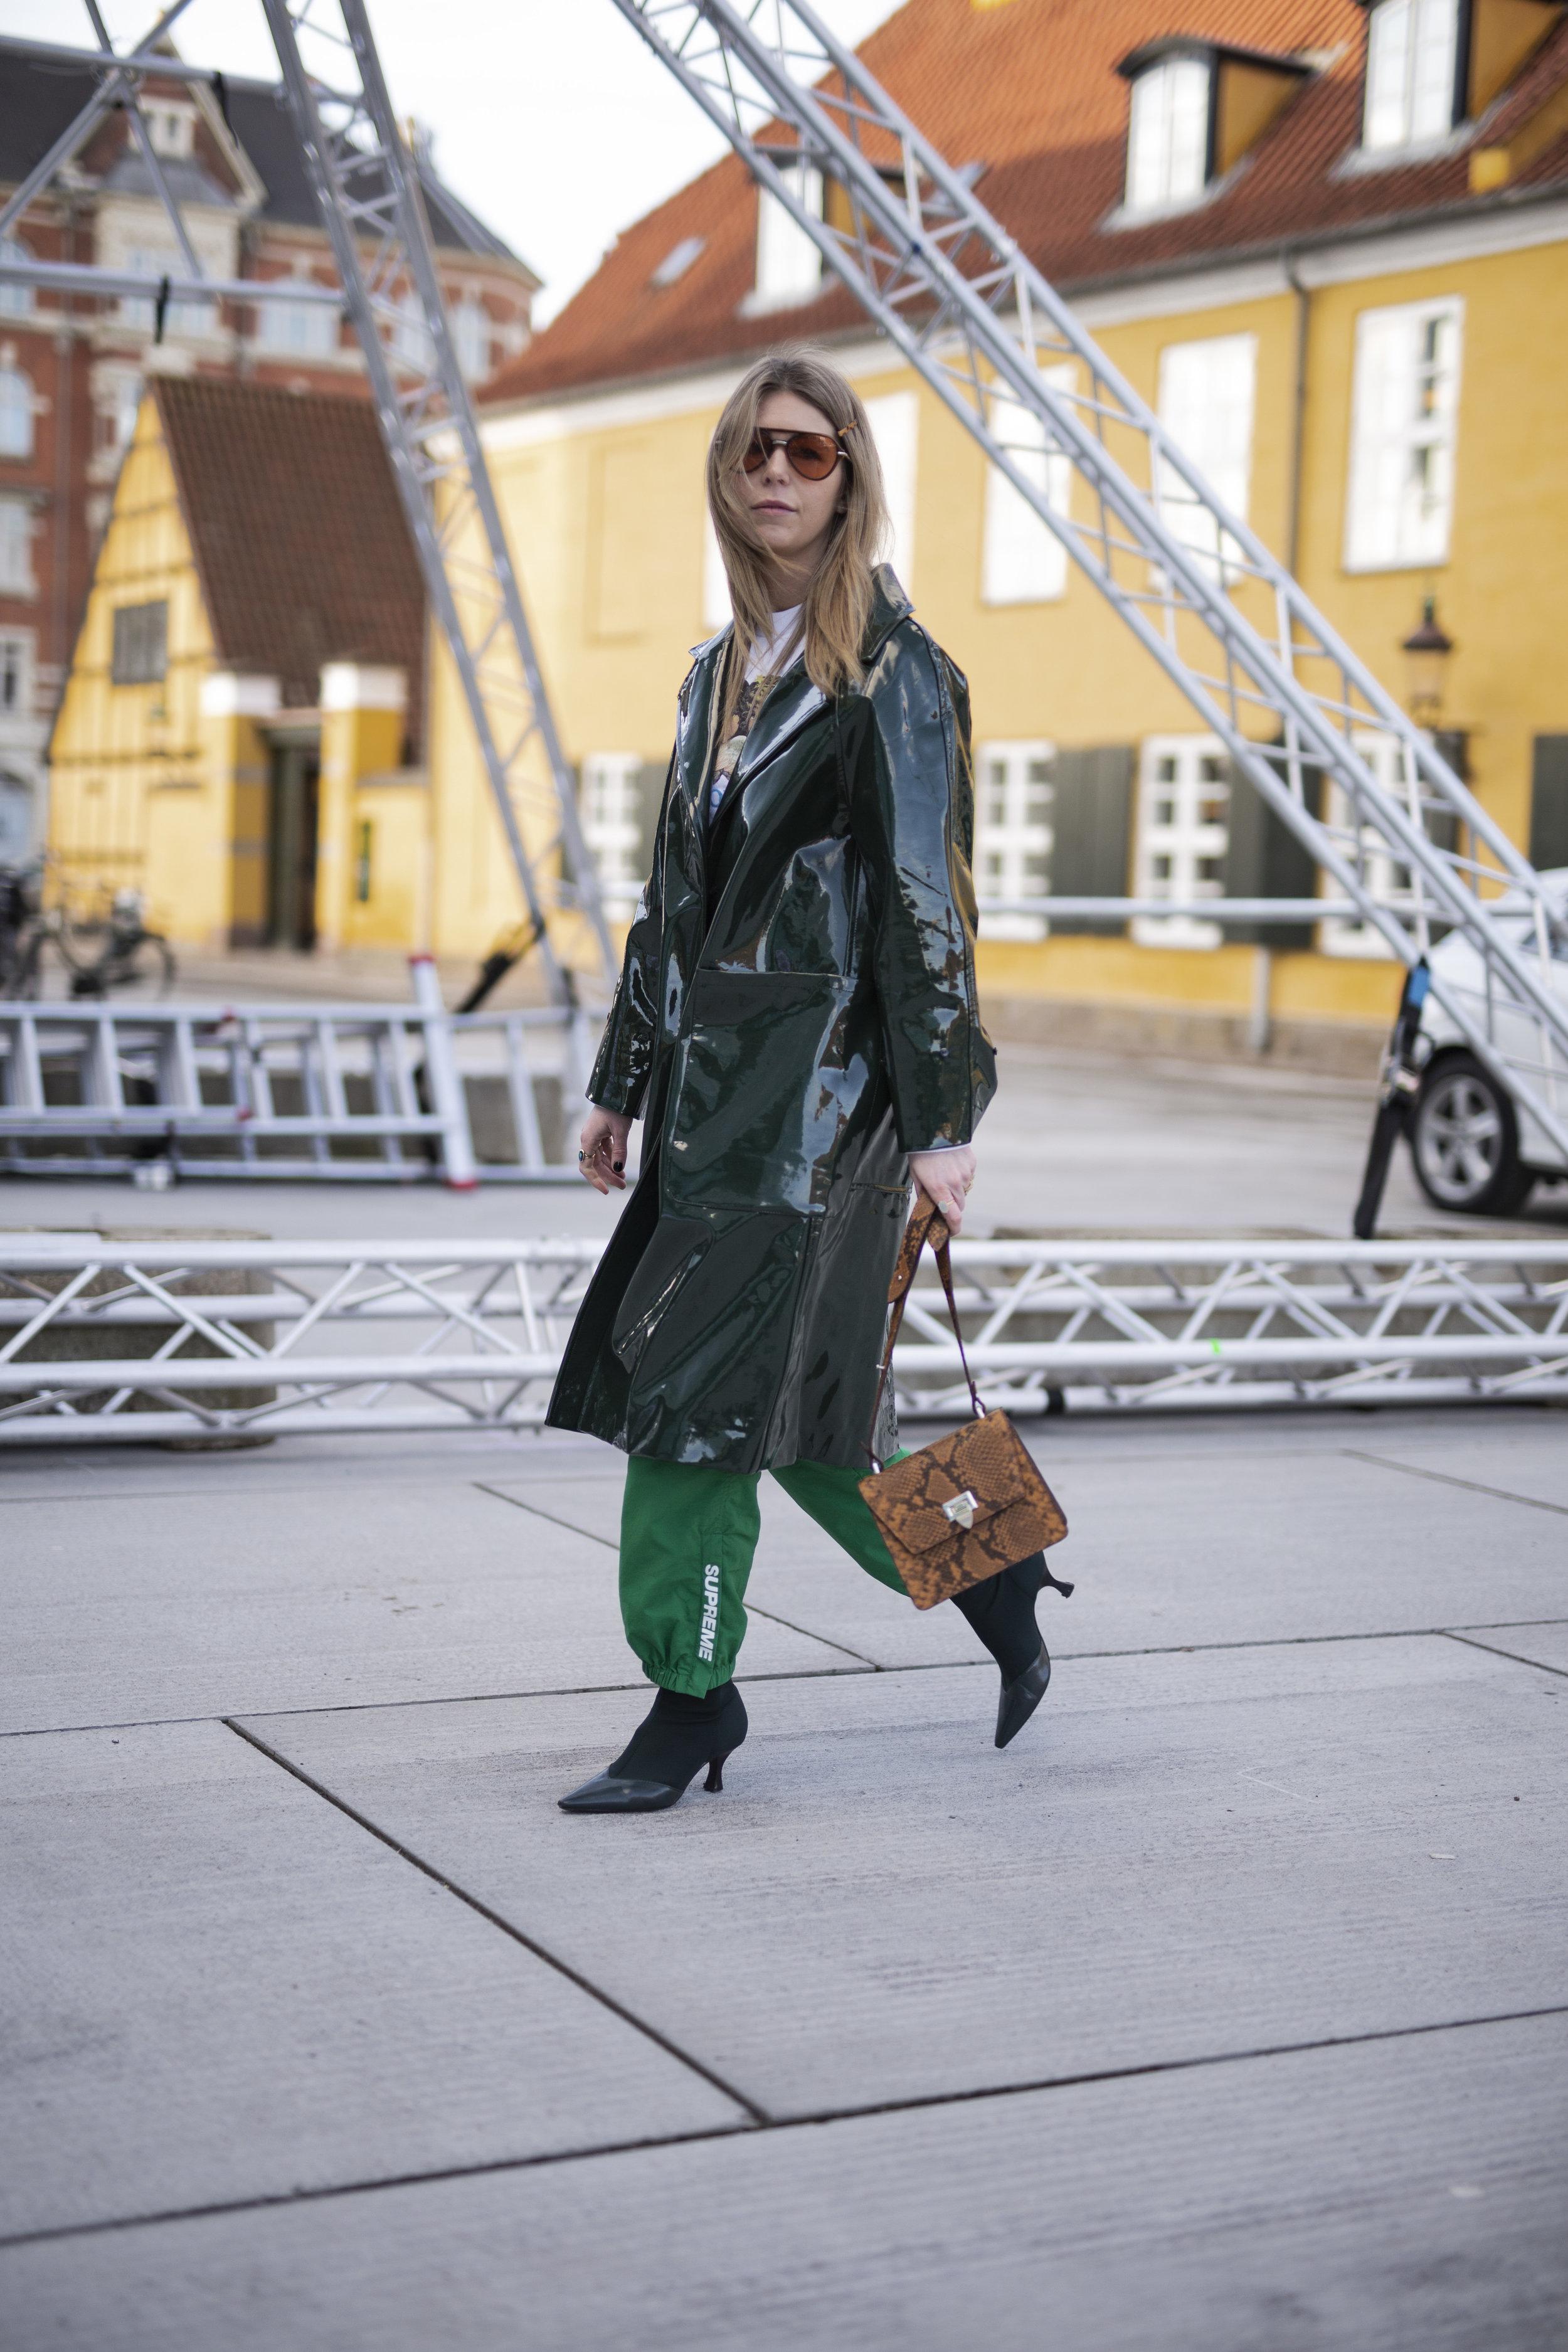 Streetstyle-Copenhagen-Fashion-Week-The-Streetland-Load-Creatives-Cathringe-Marie-131.jpg